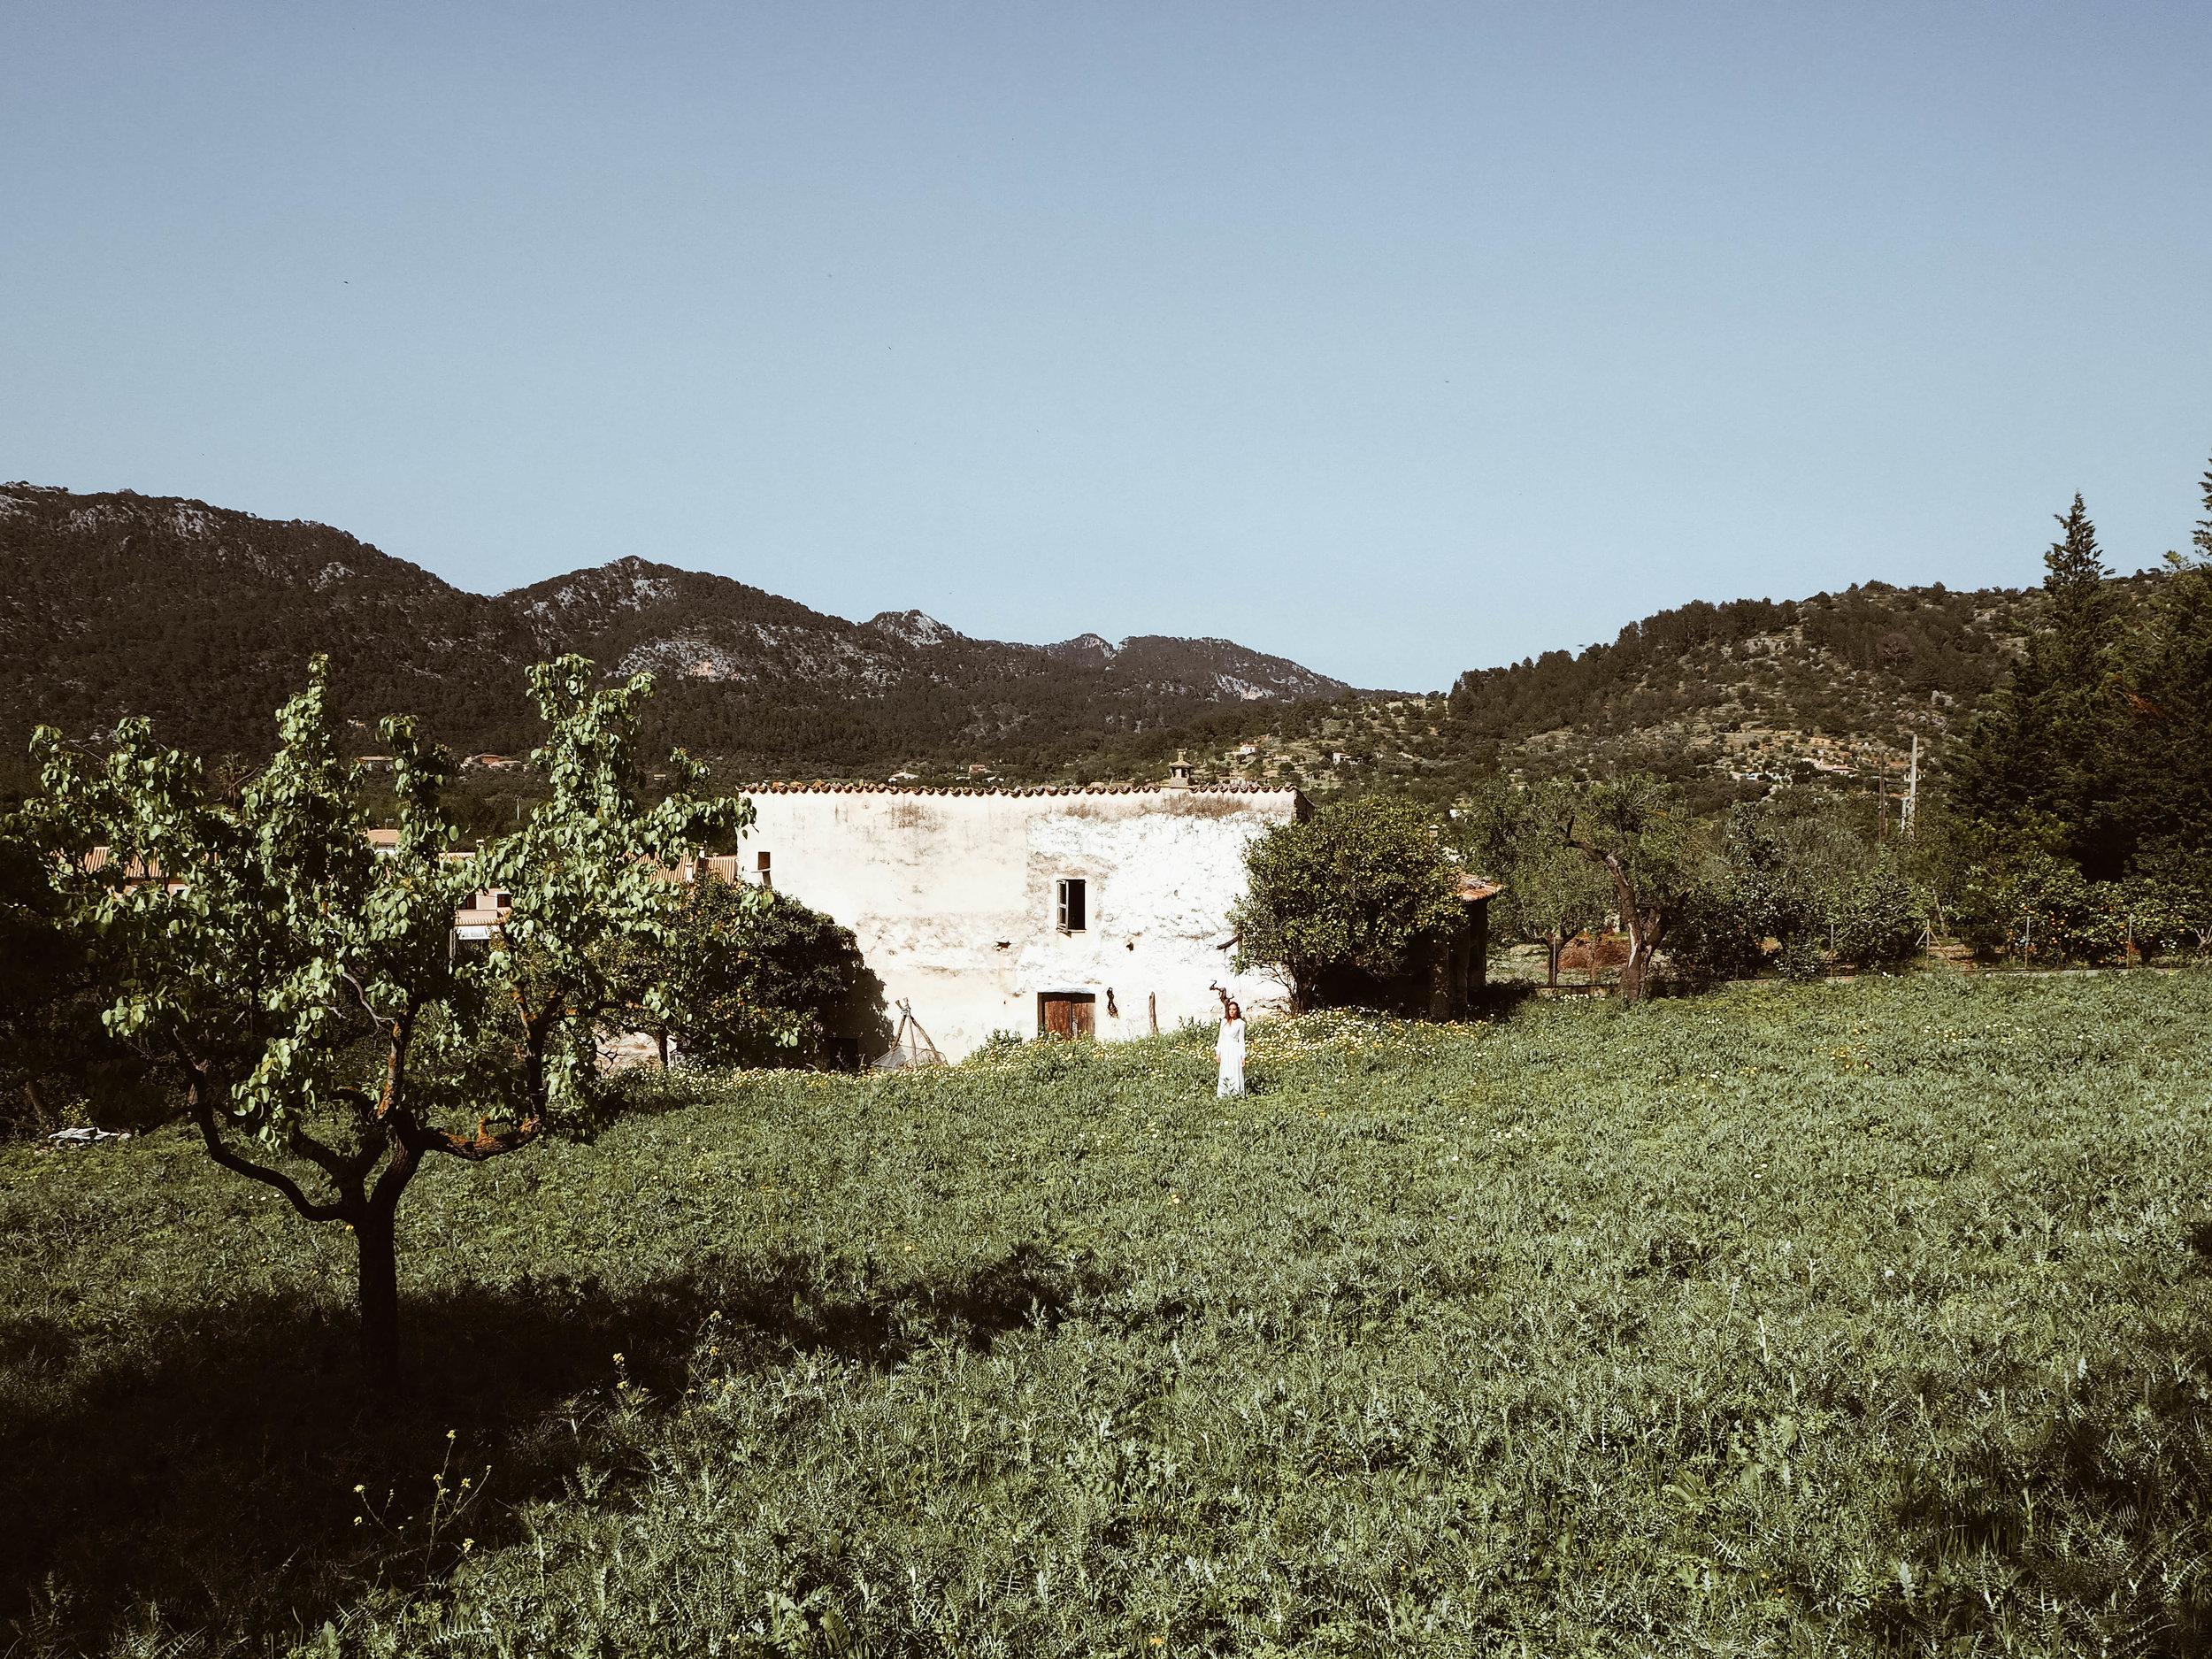 Mallorca Berge und Finca